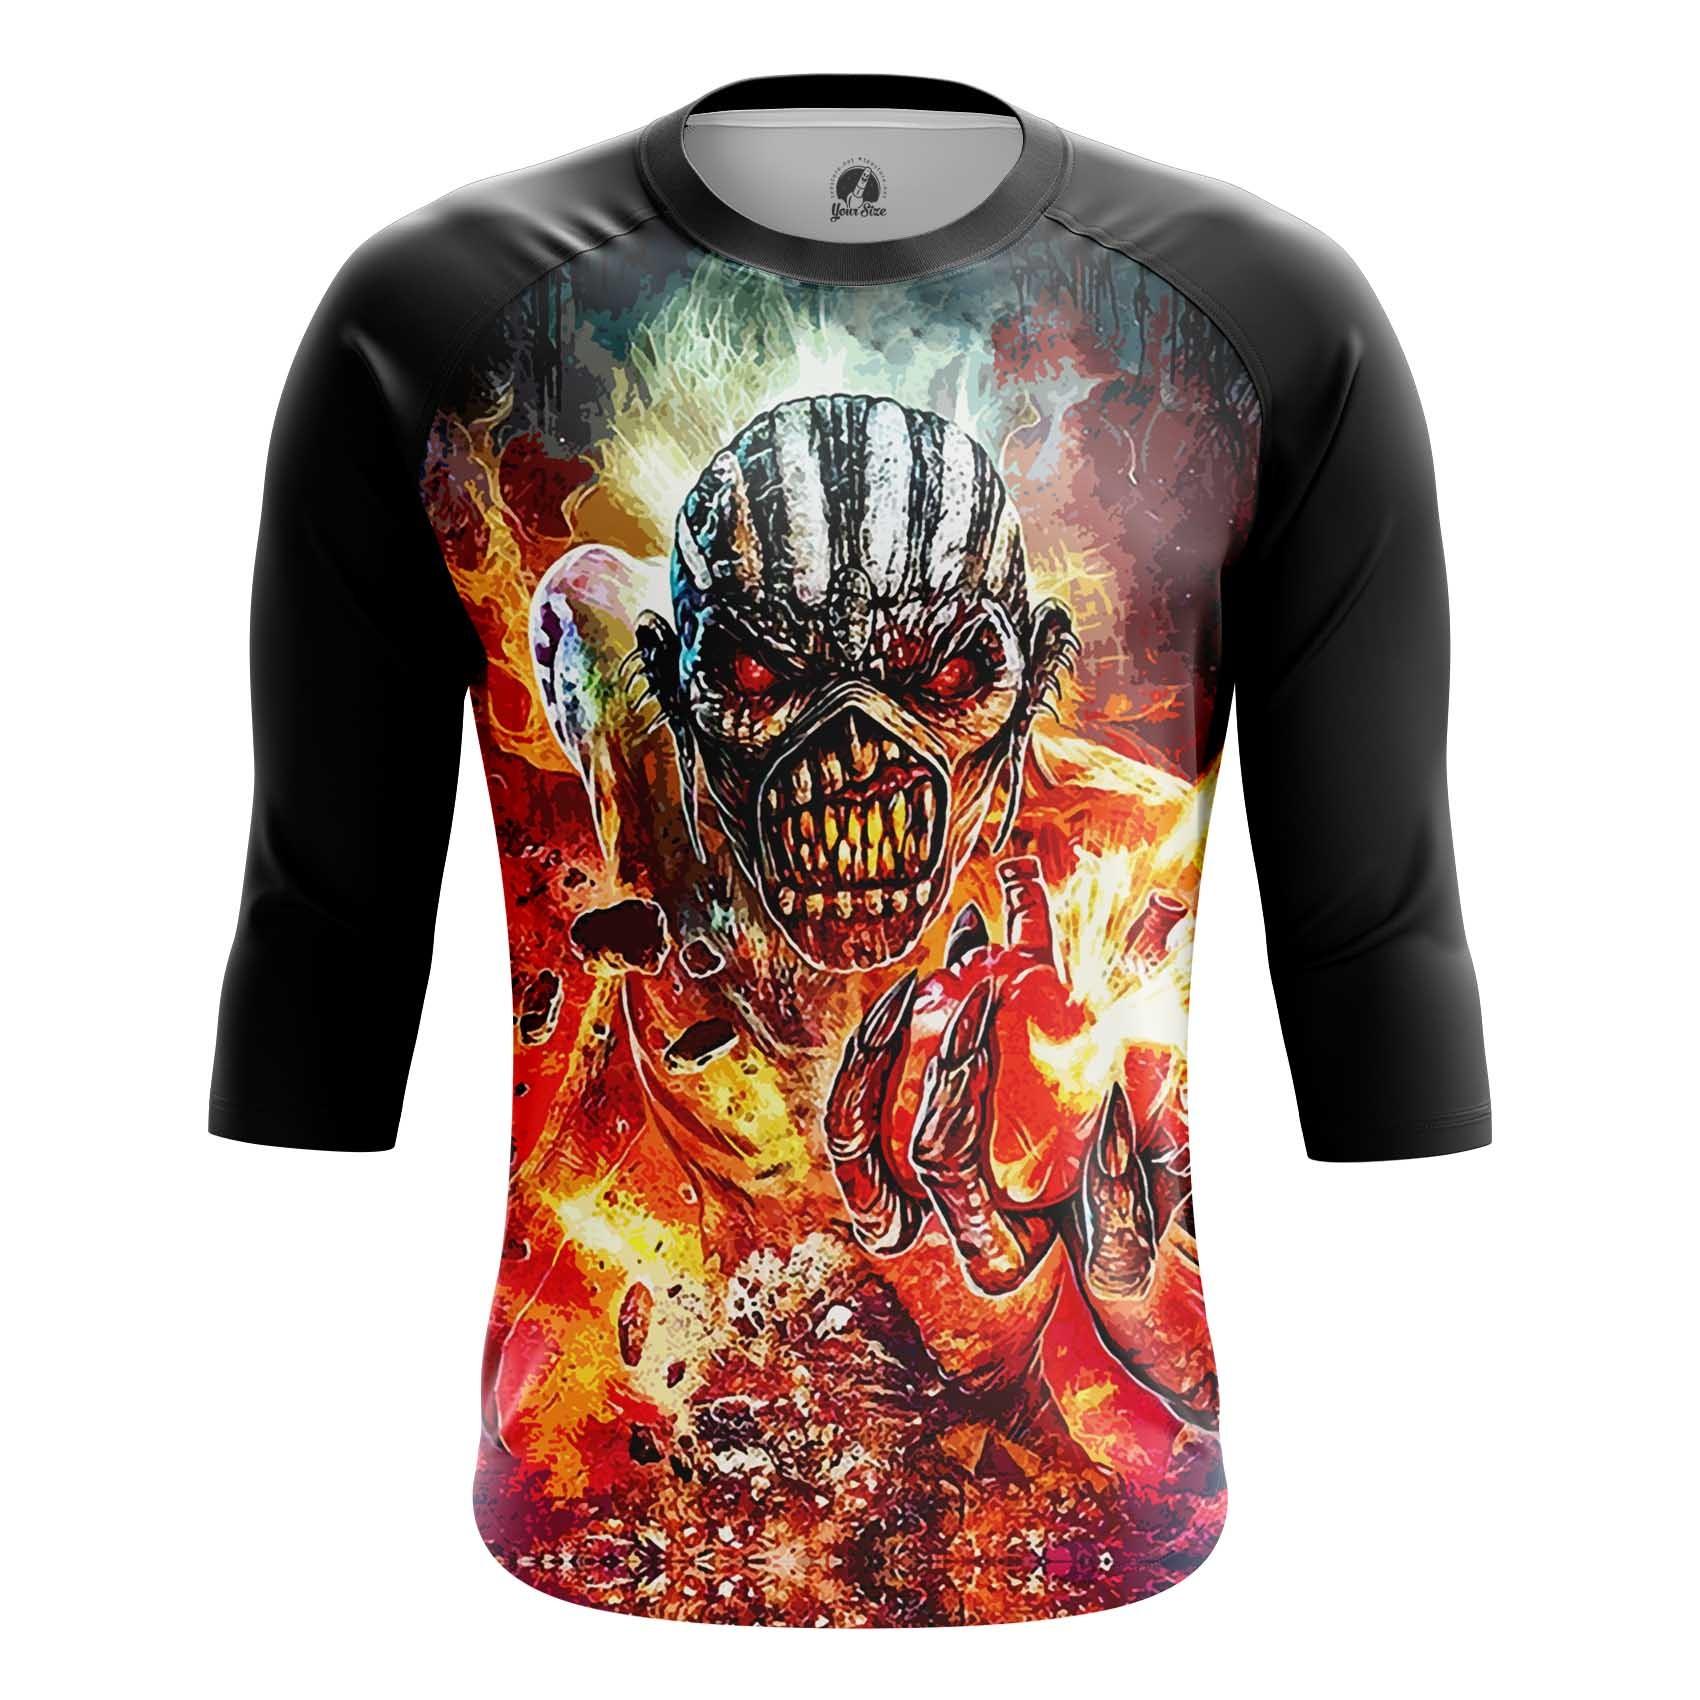 Merchandise Men'S T-Shirt Iron Maiden Book Of Souls